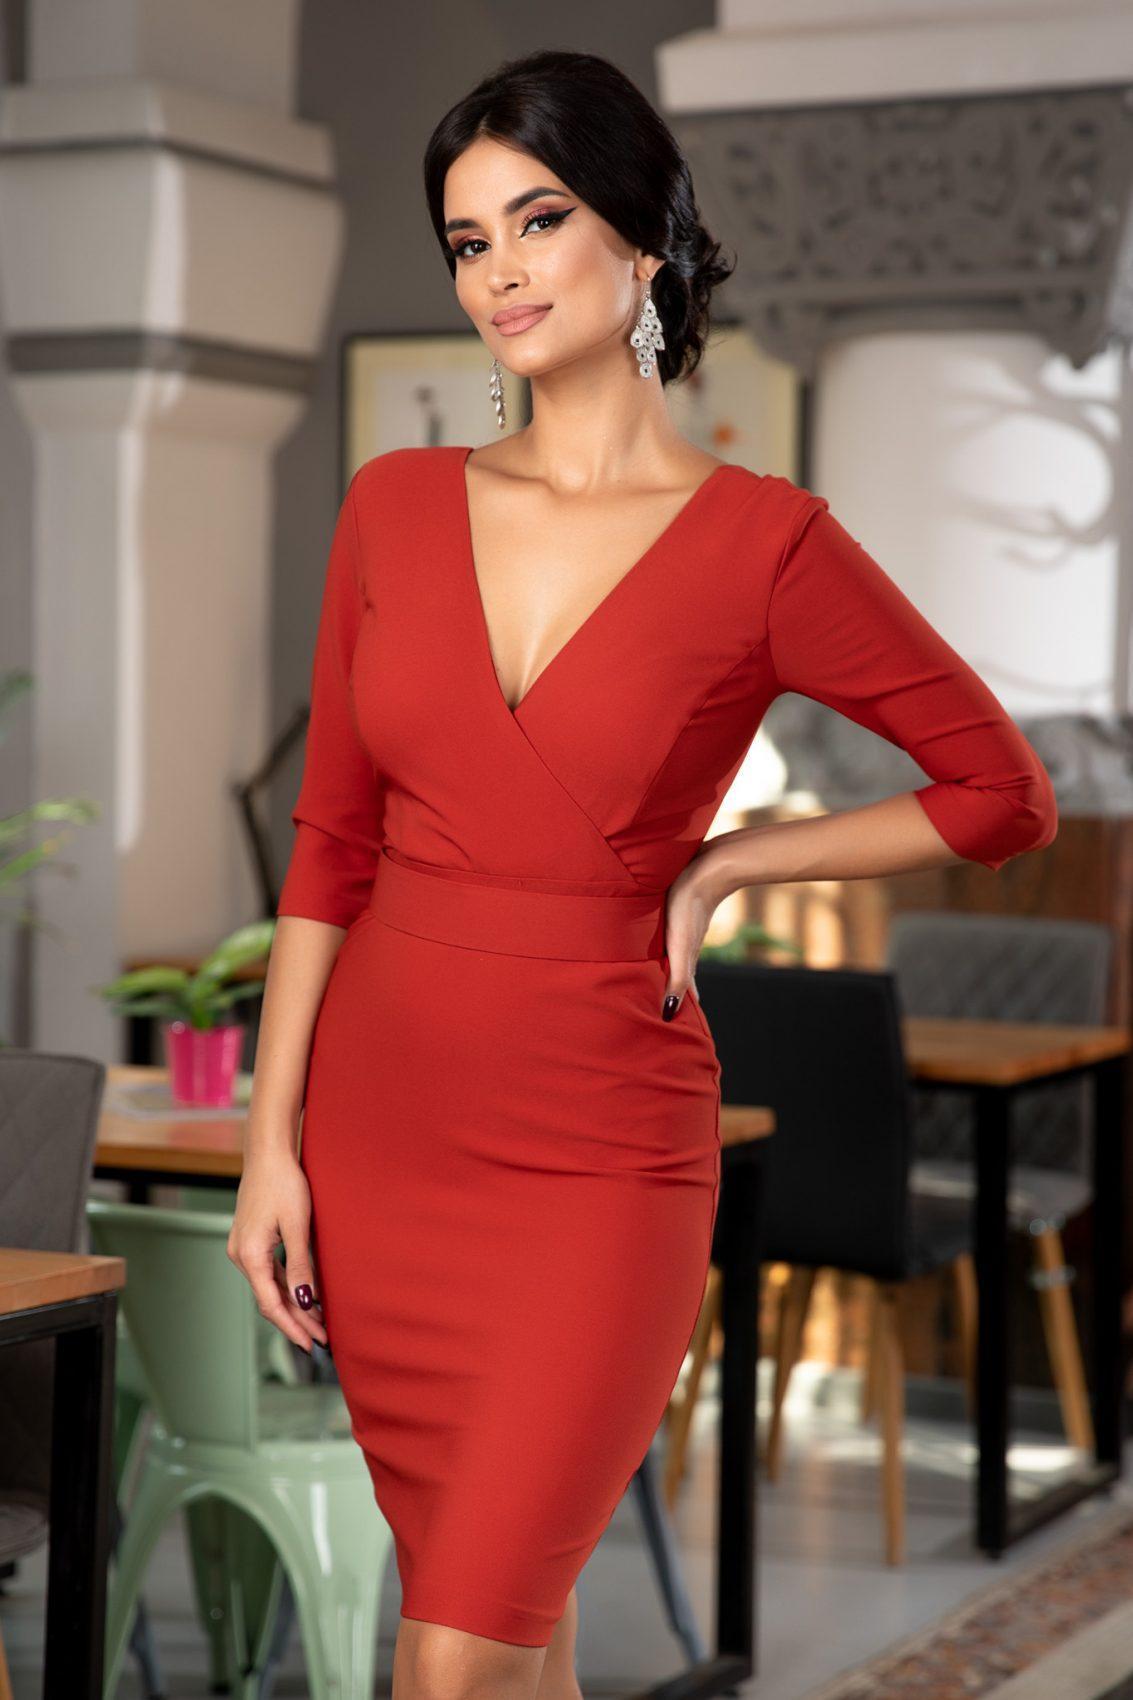 Malvina Κεραμιδί Φόρεμα 5369